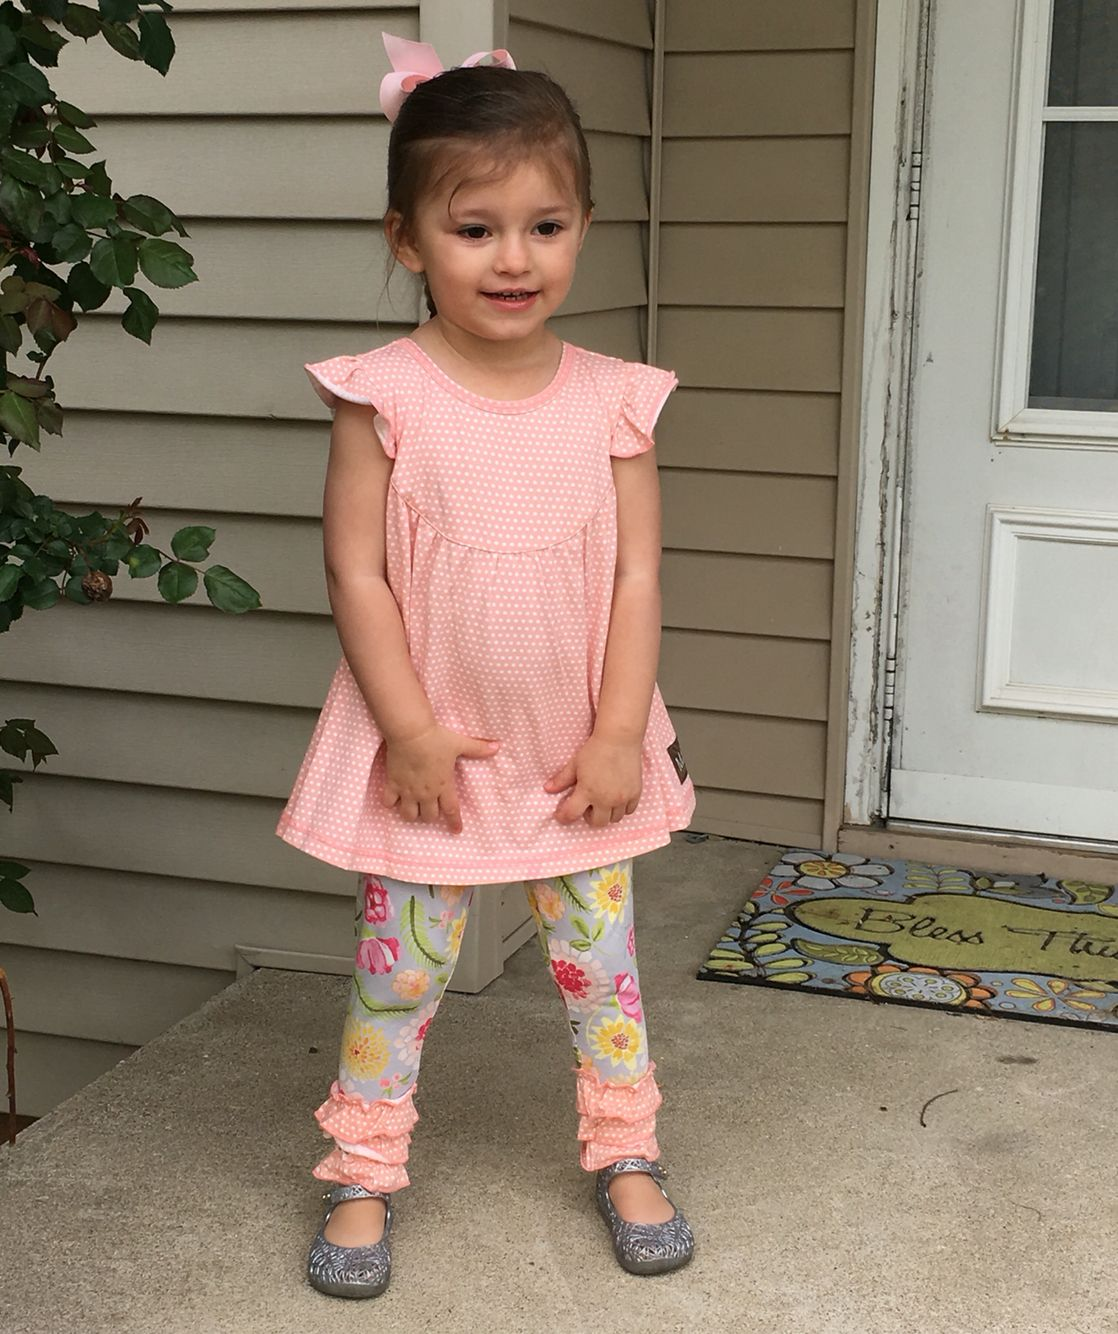 Ma matilda jane good luck trunk coupon code - Matilda Jane Pretty Pink Pearls Pearl Fragrance Floral Leggings